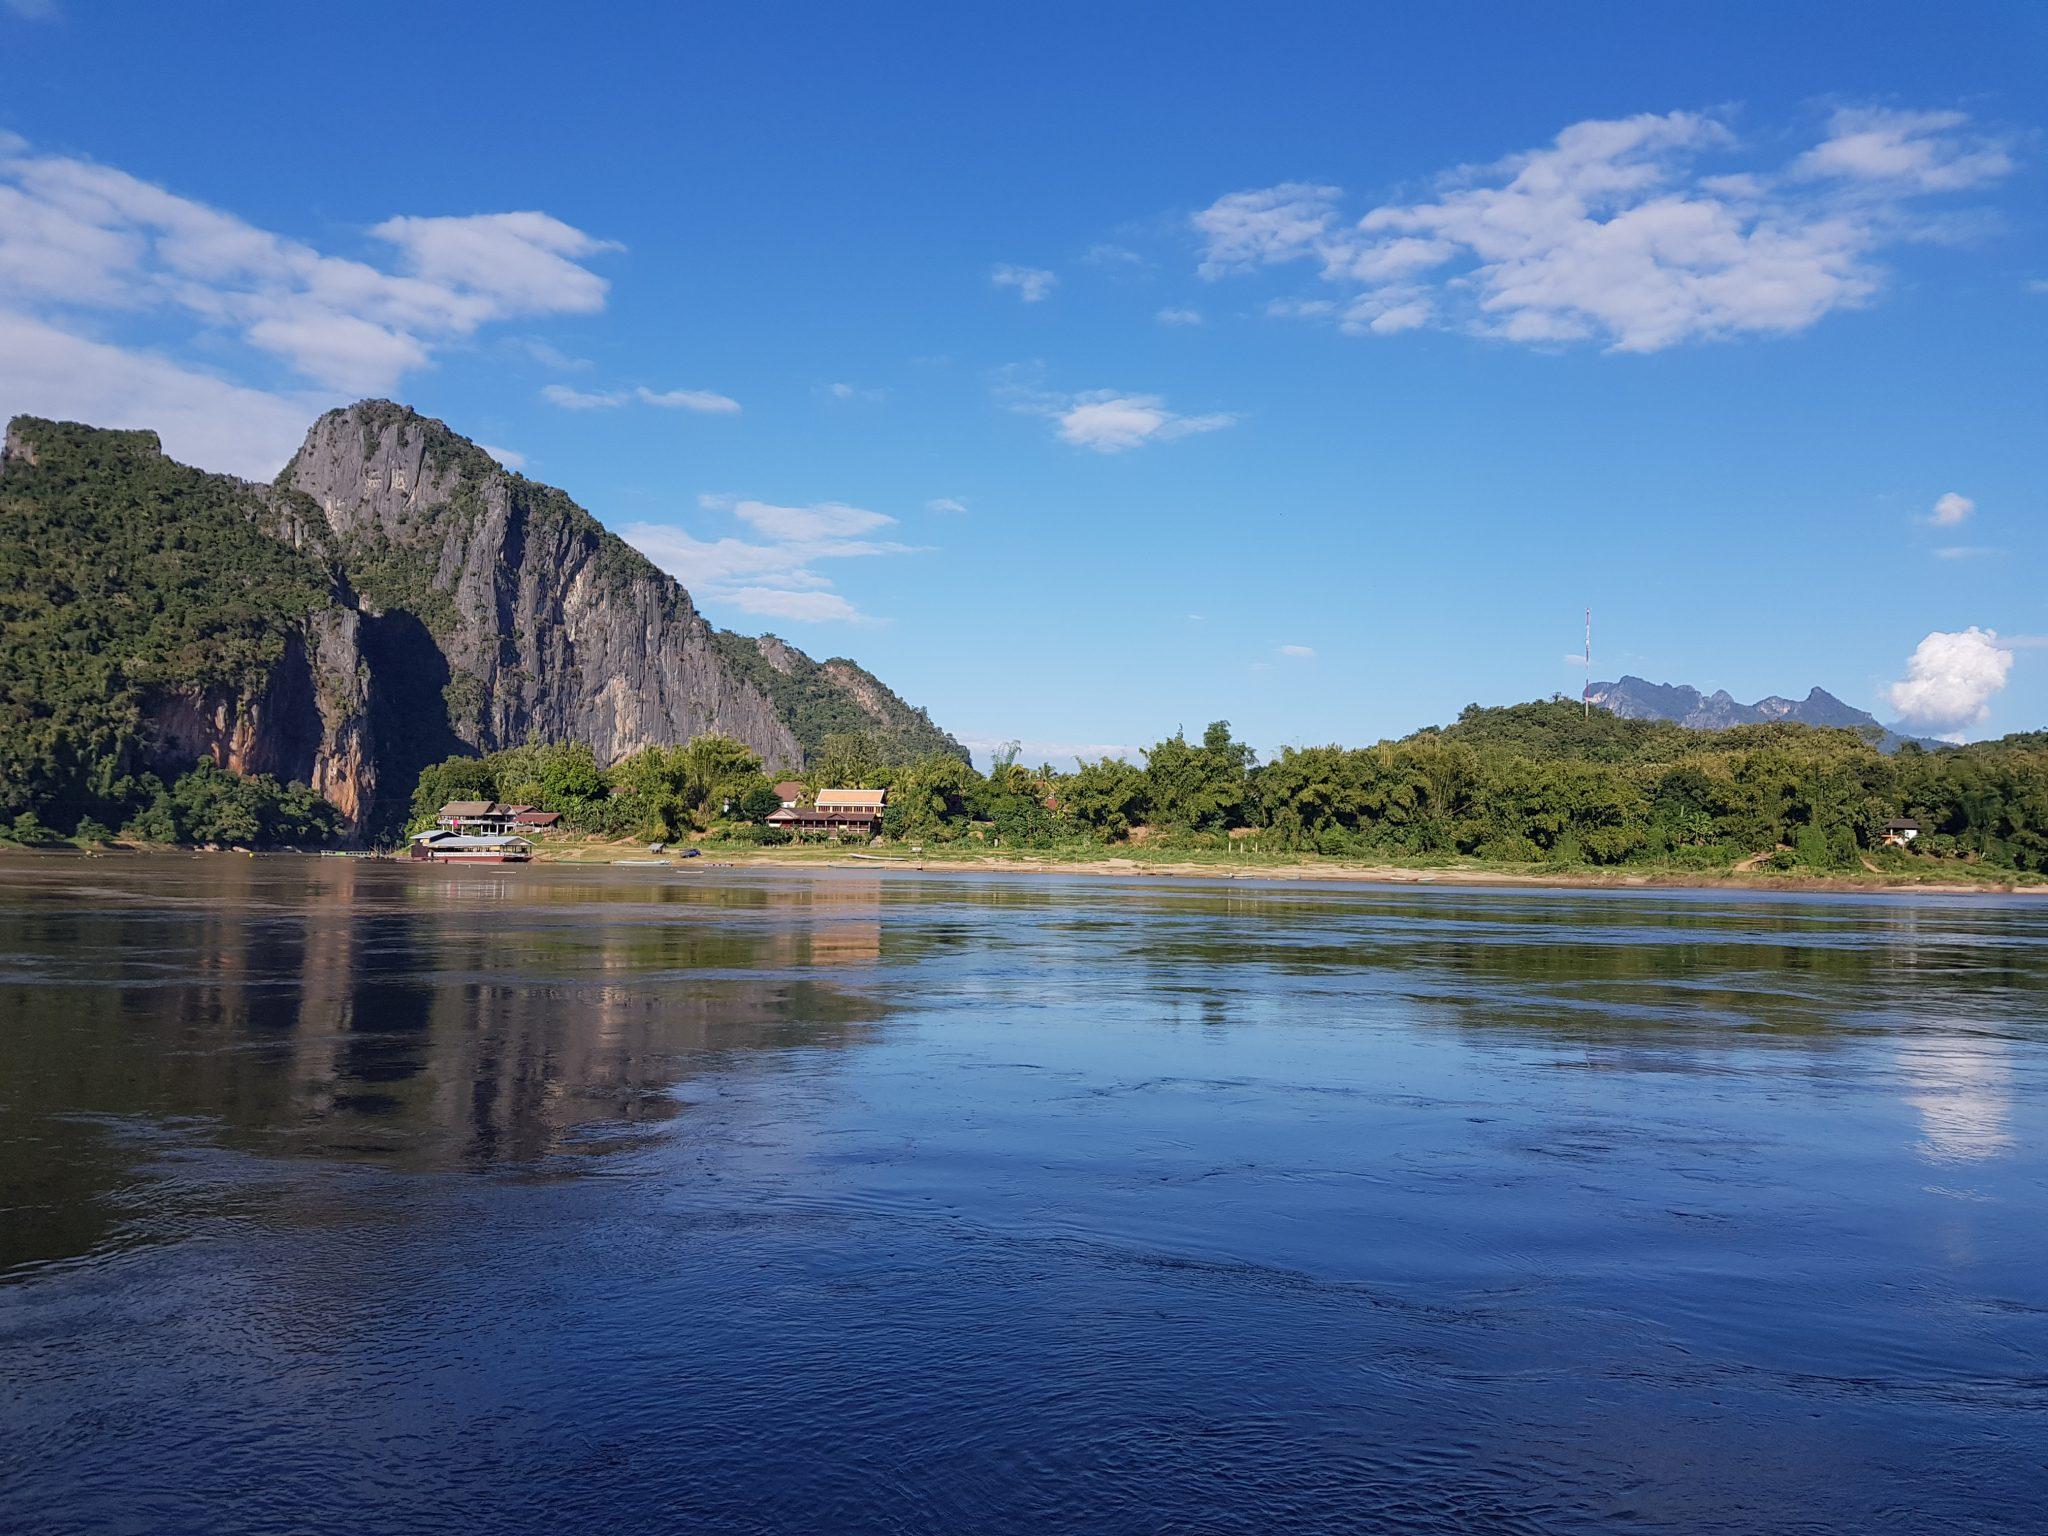 lange Flussfahrt über den Mekong